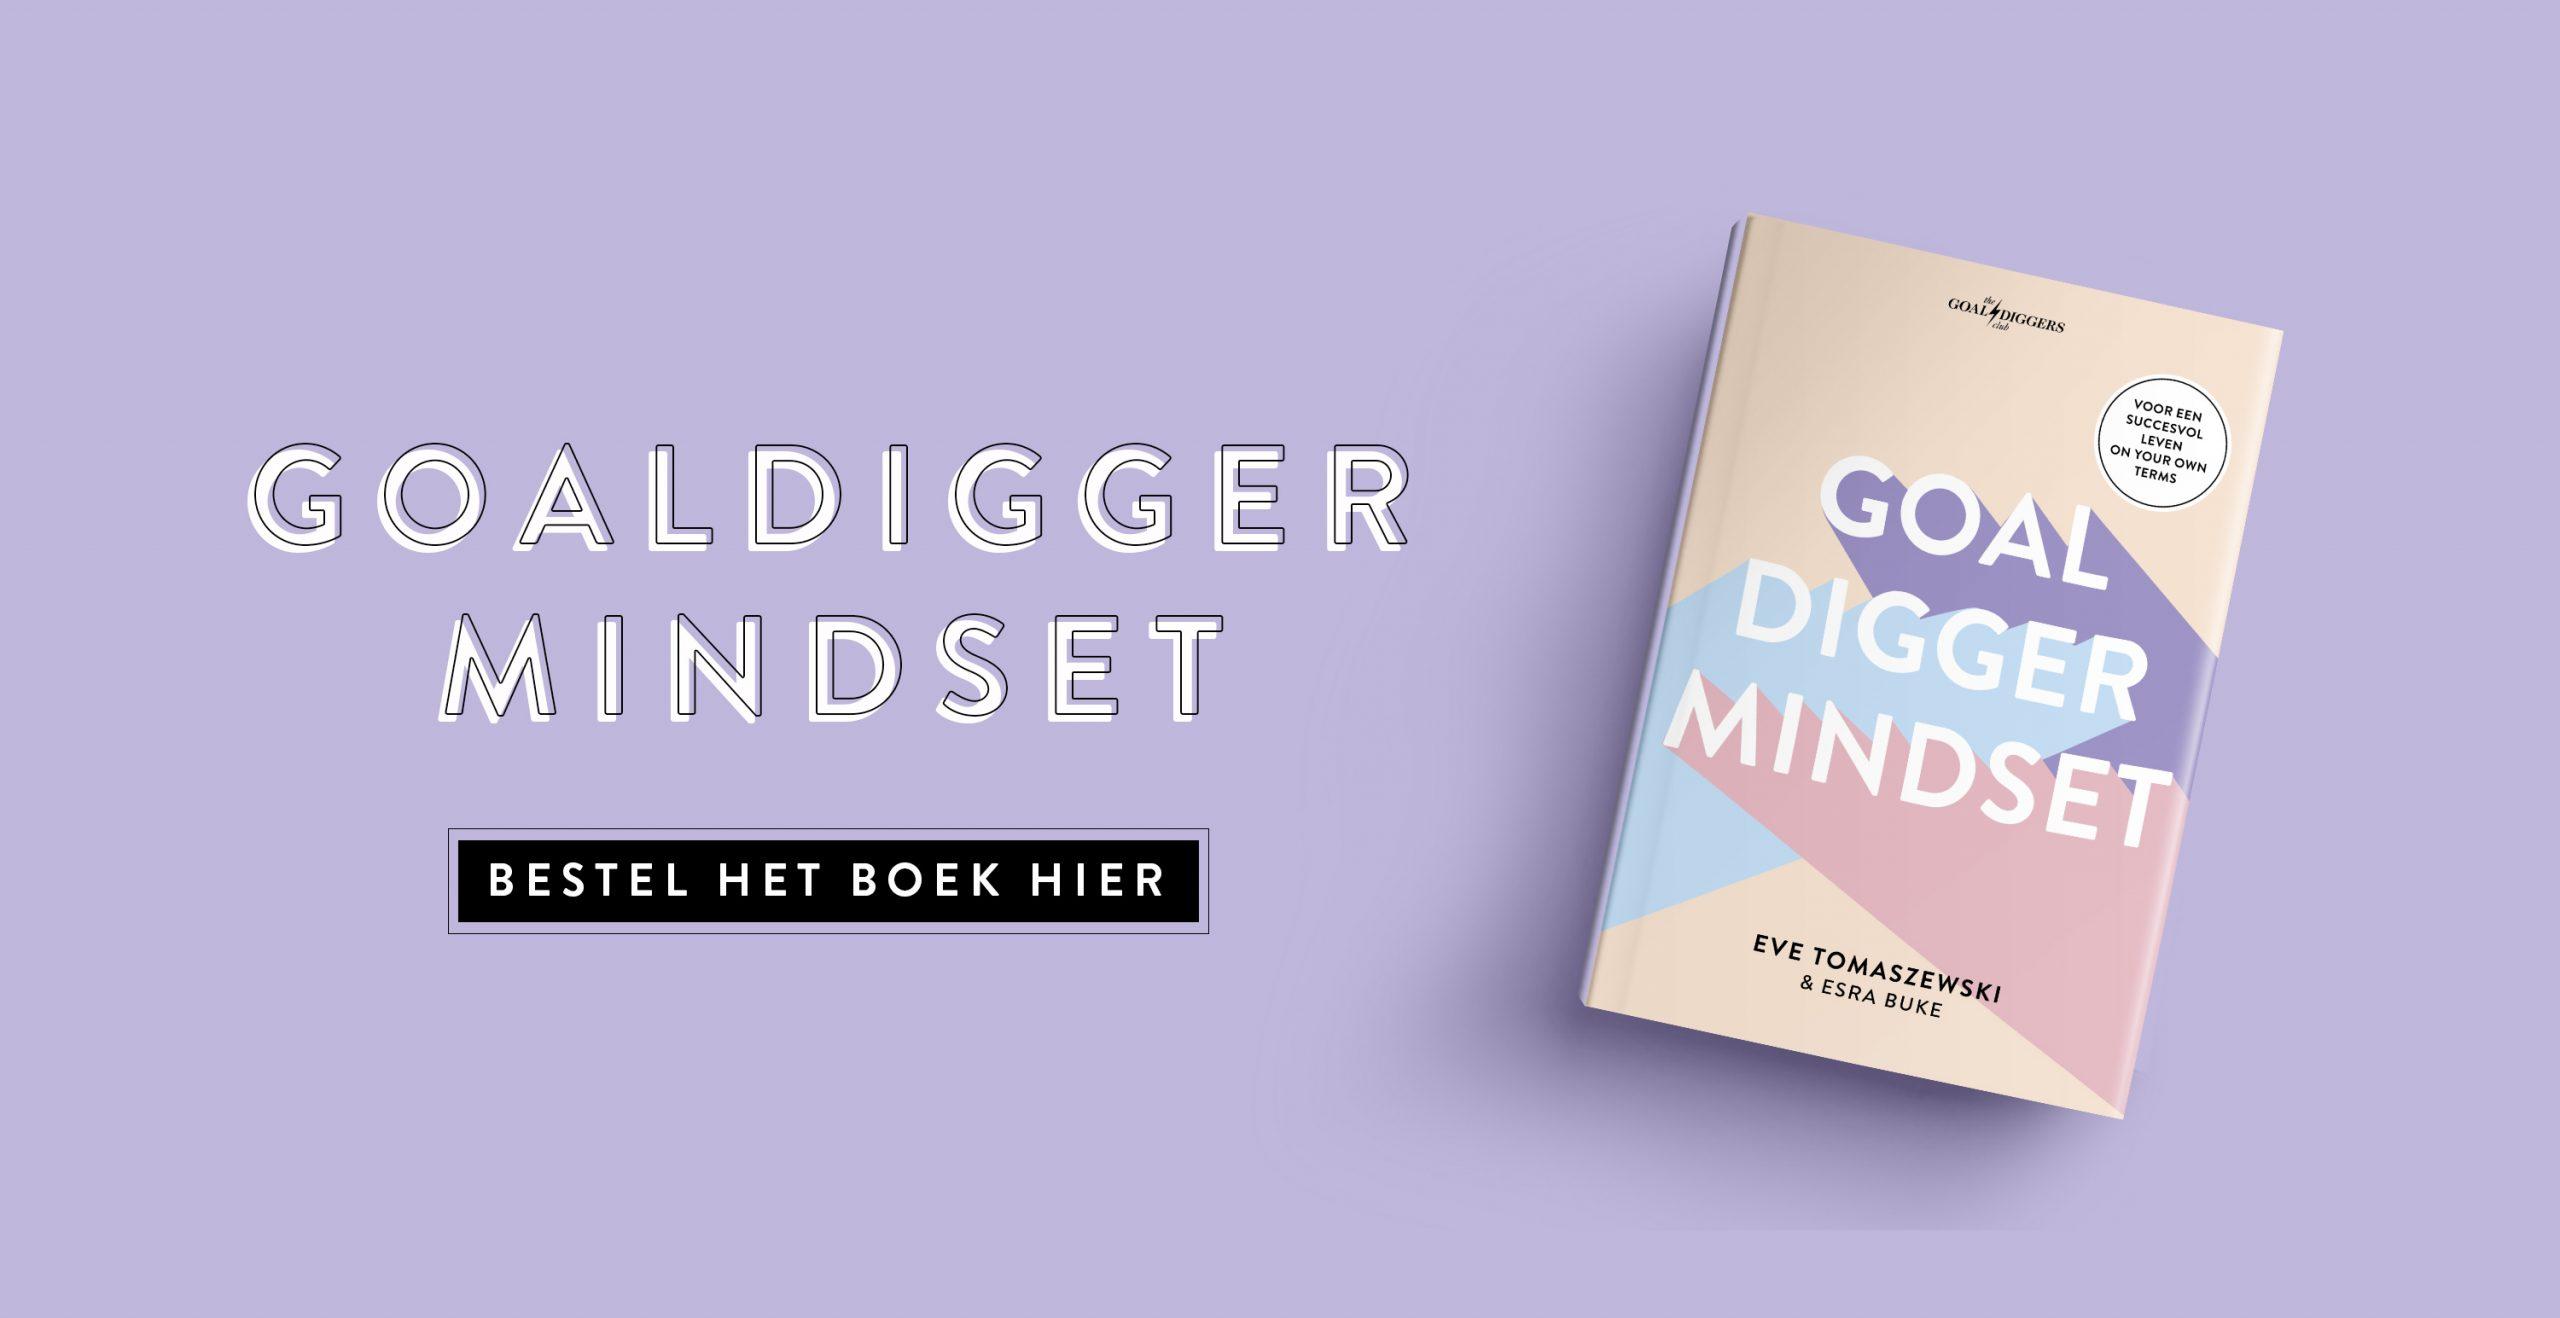 Goaldigger-Mindset